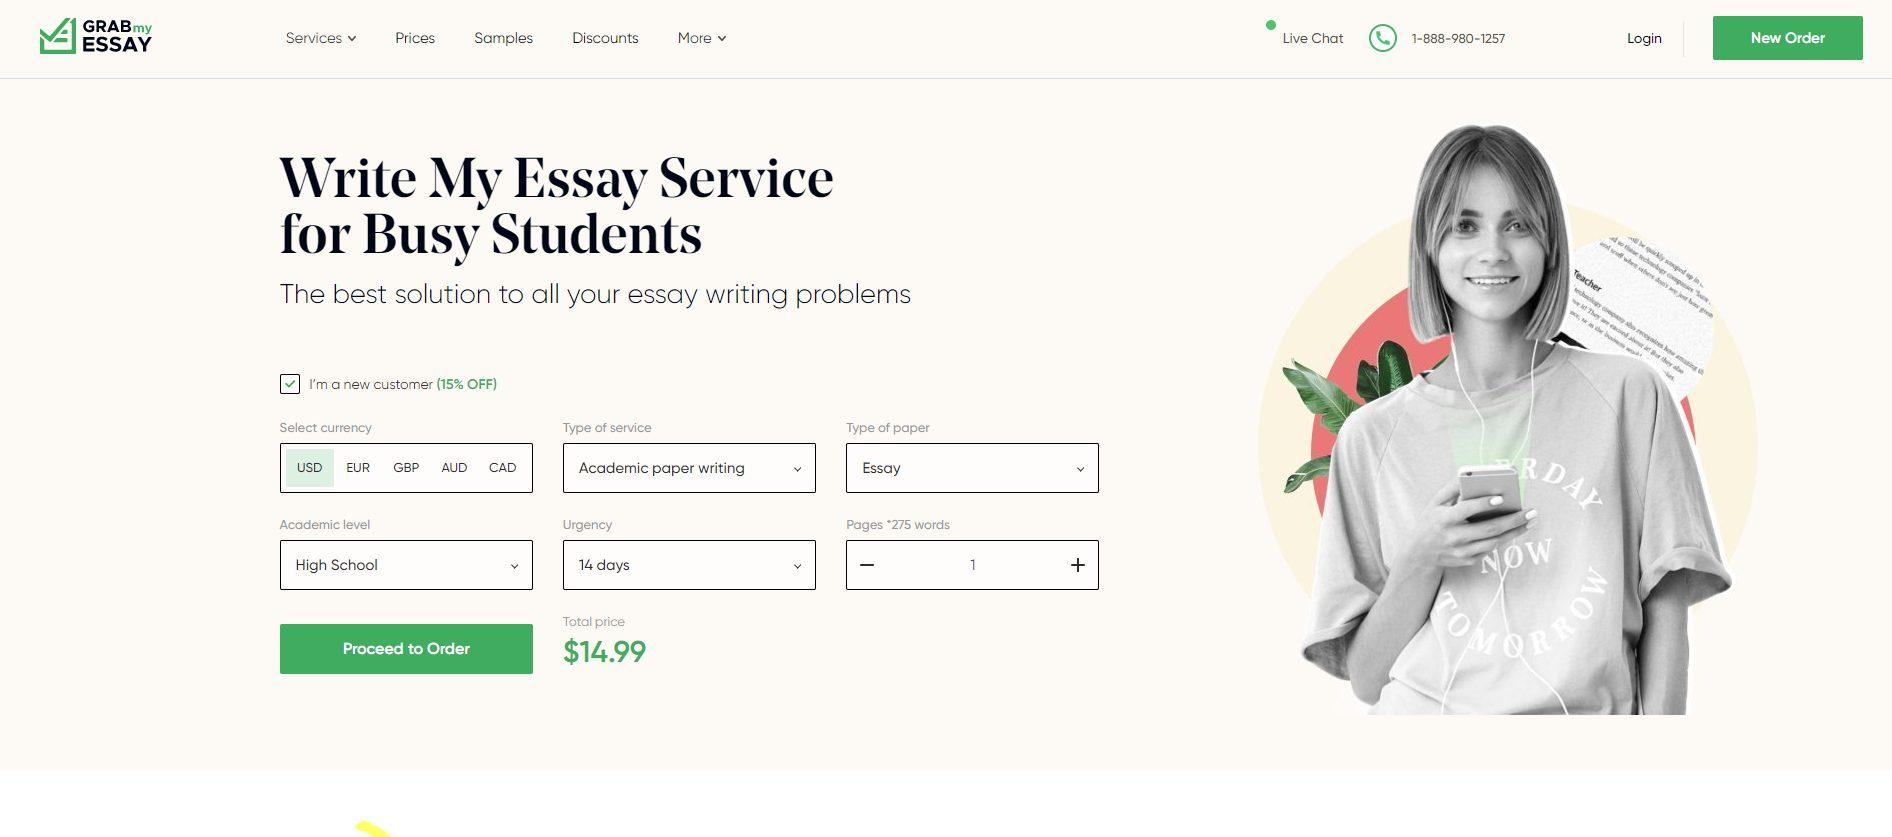 grabmyessay - Best essay writing service